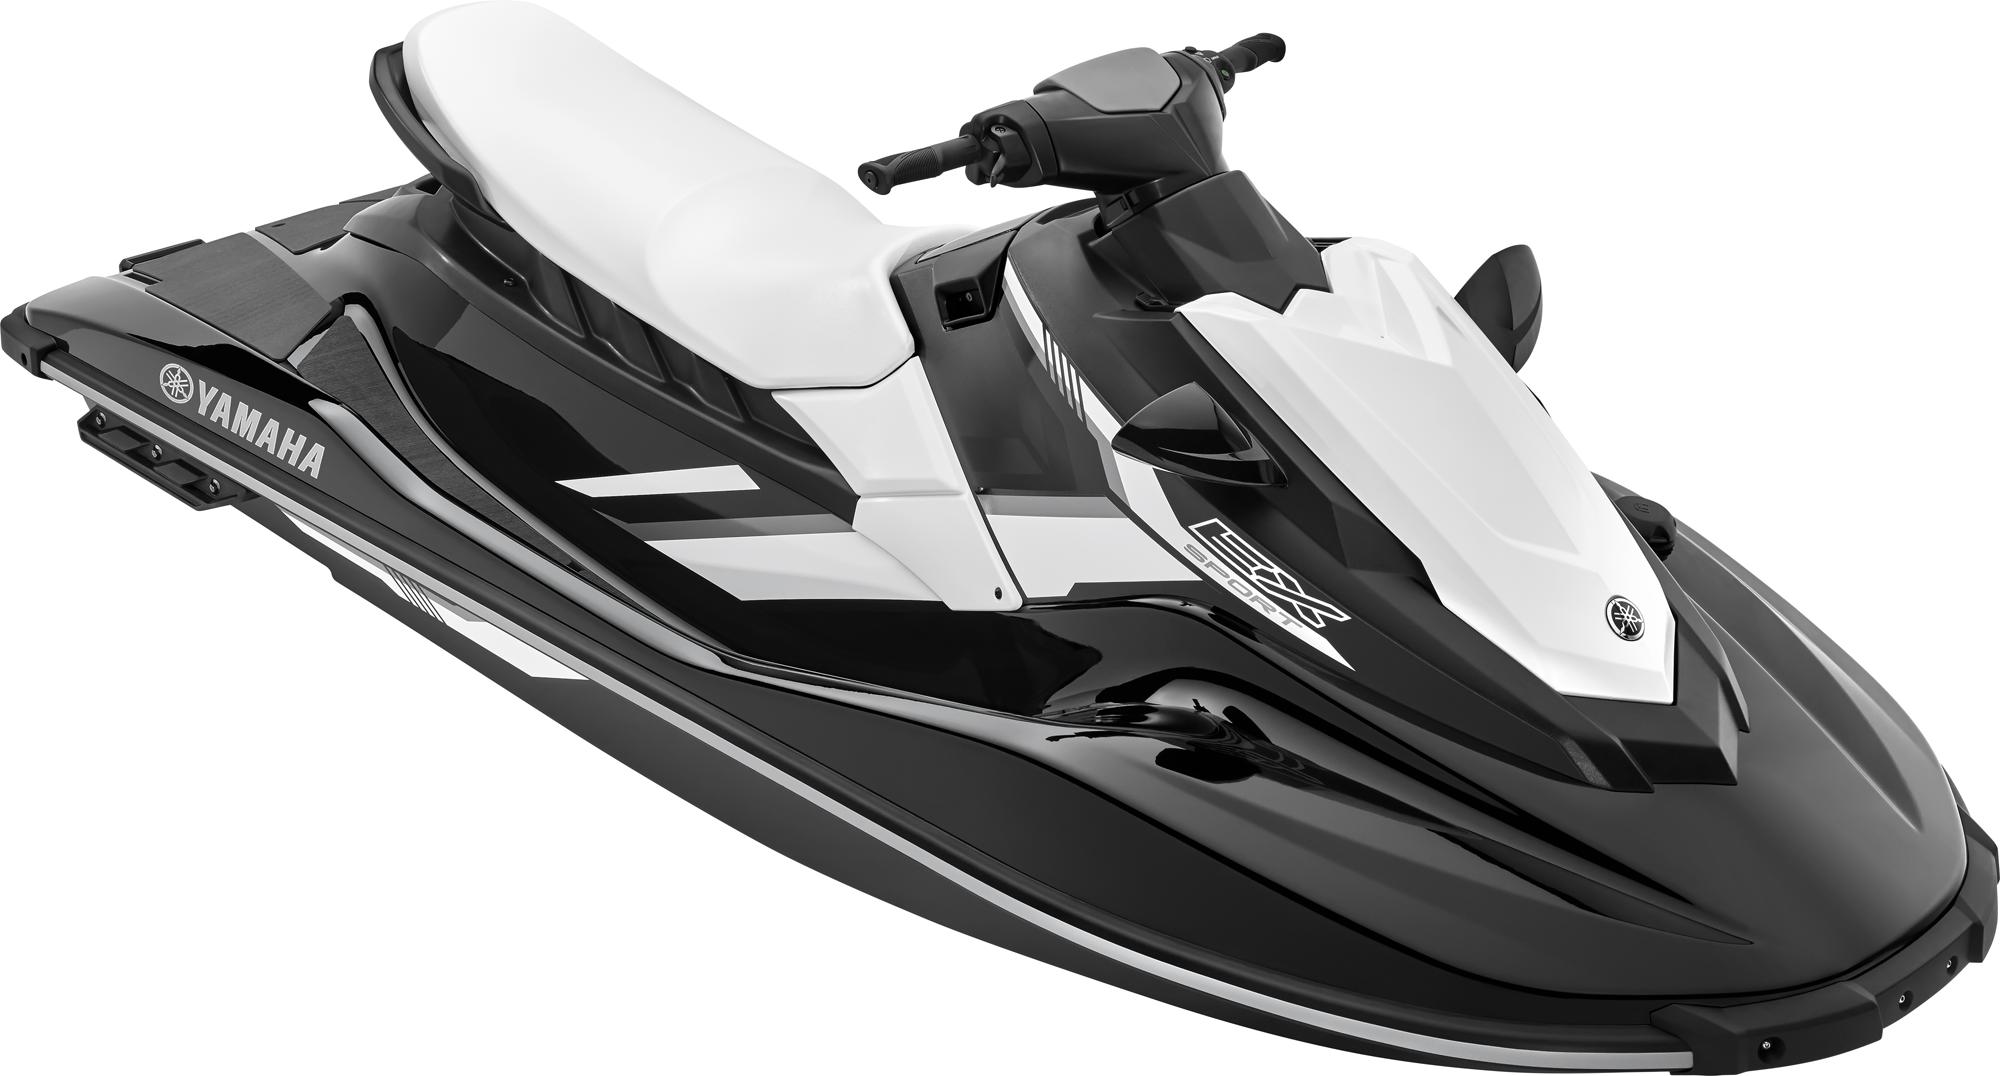 Black Jet Ski PNG Image Mastercraft ski boats, Jet ski